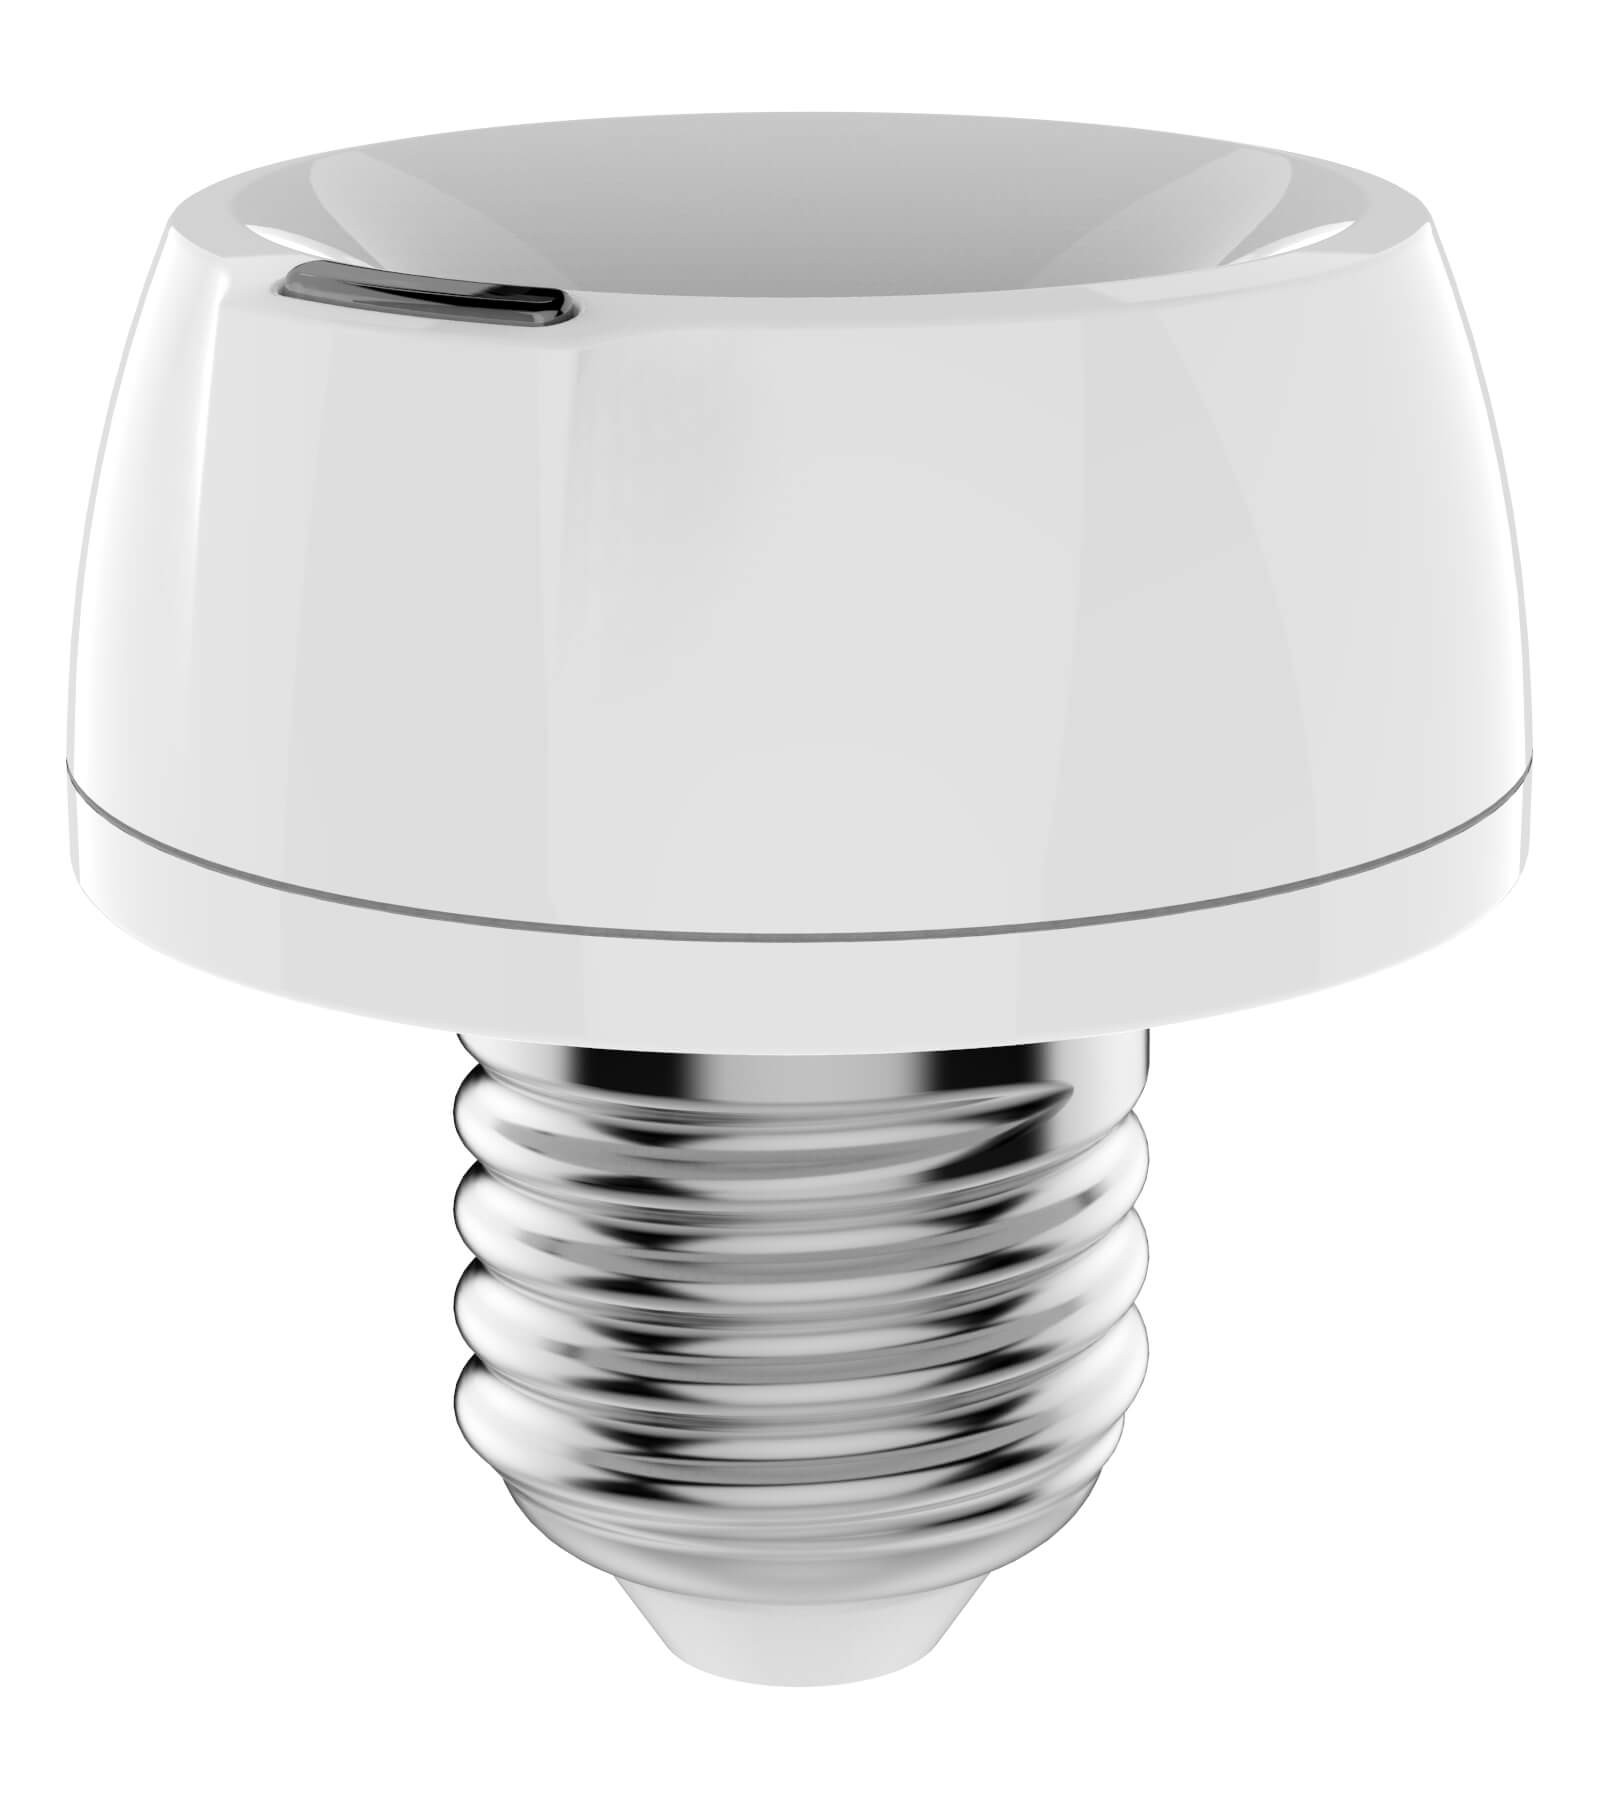 z wave plus philio lampe fatning med indbygget lysd mper phiepad02 ean 4713698574406. Black Bedroom Furniture Sets. Home Design Ideas